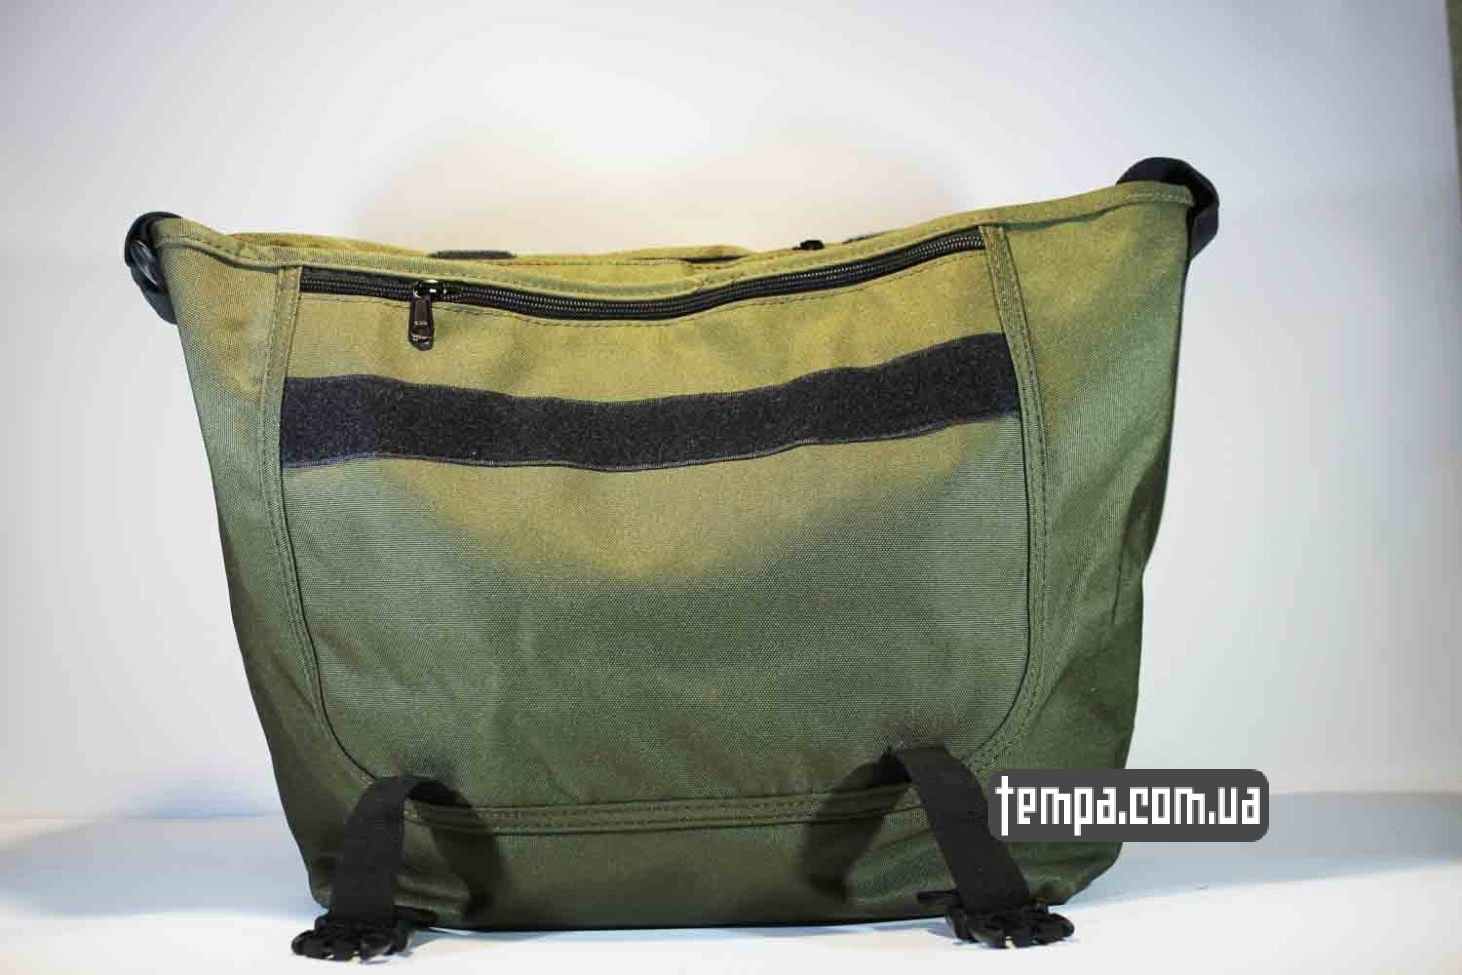 carhartt green сумка через плечо carhartt зеленая купить Украина